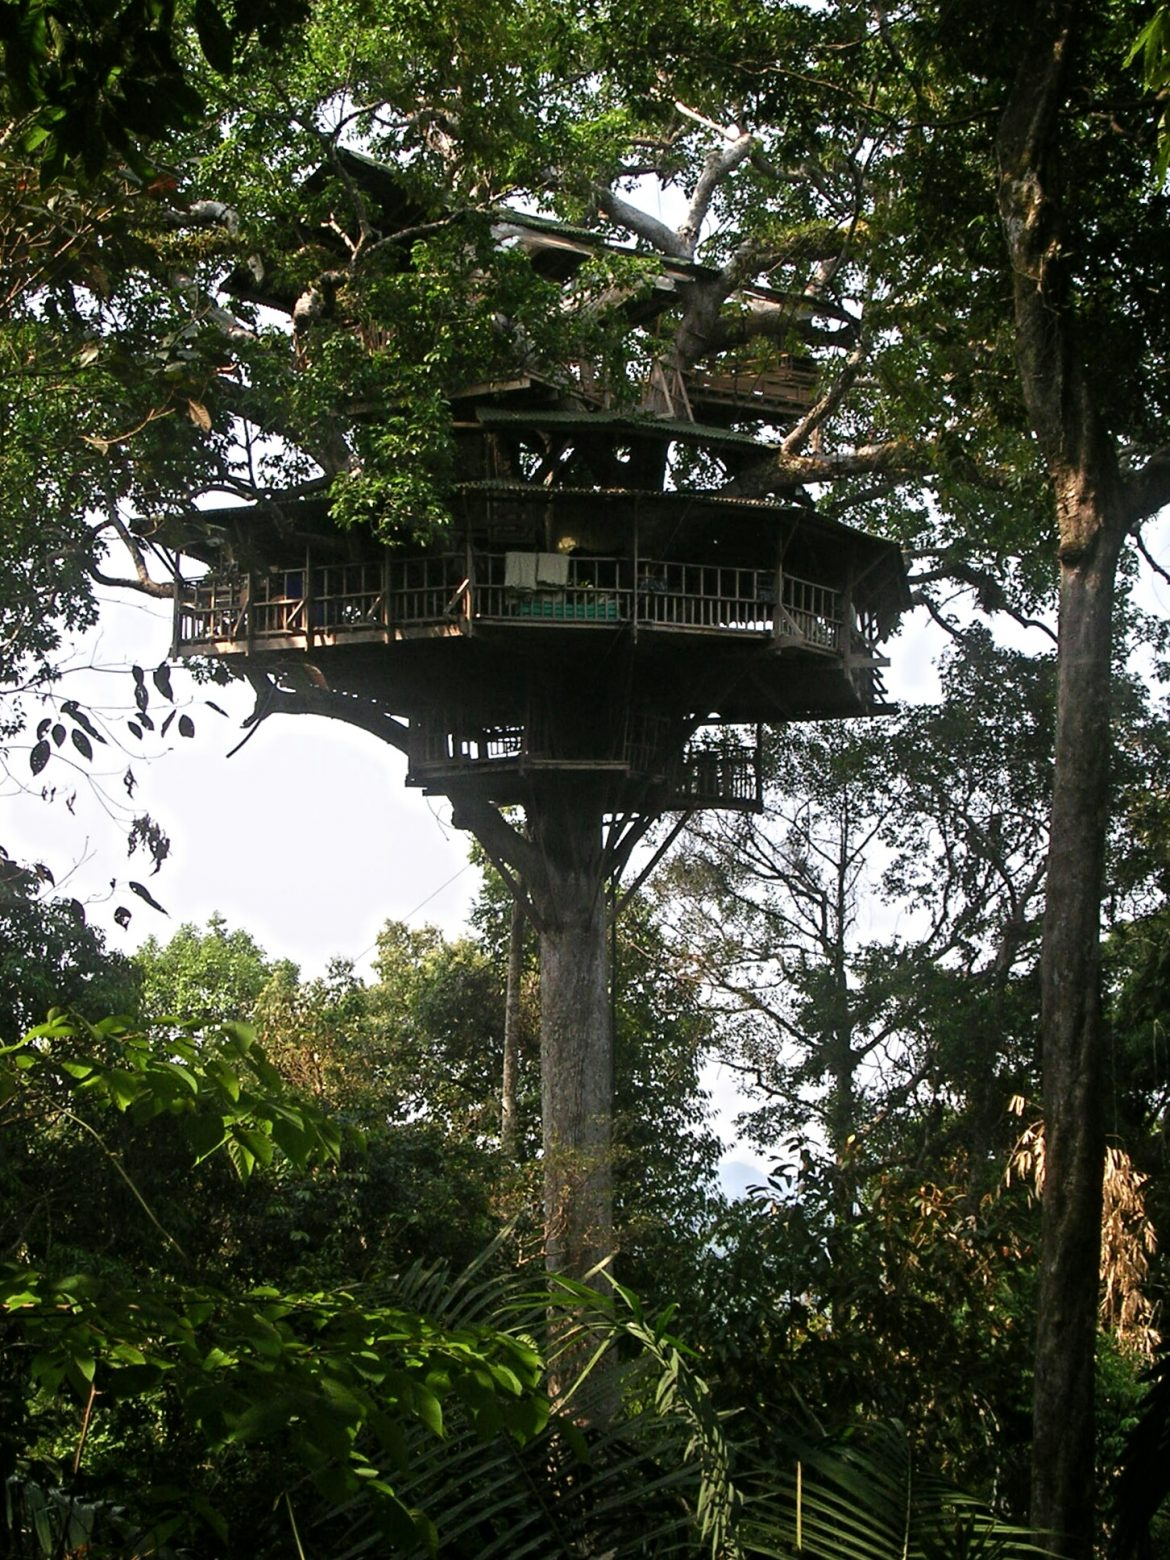 Baumhaus von Gibbon Experience Huay Xai